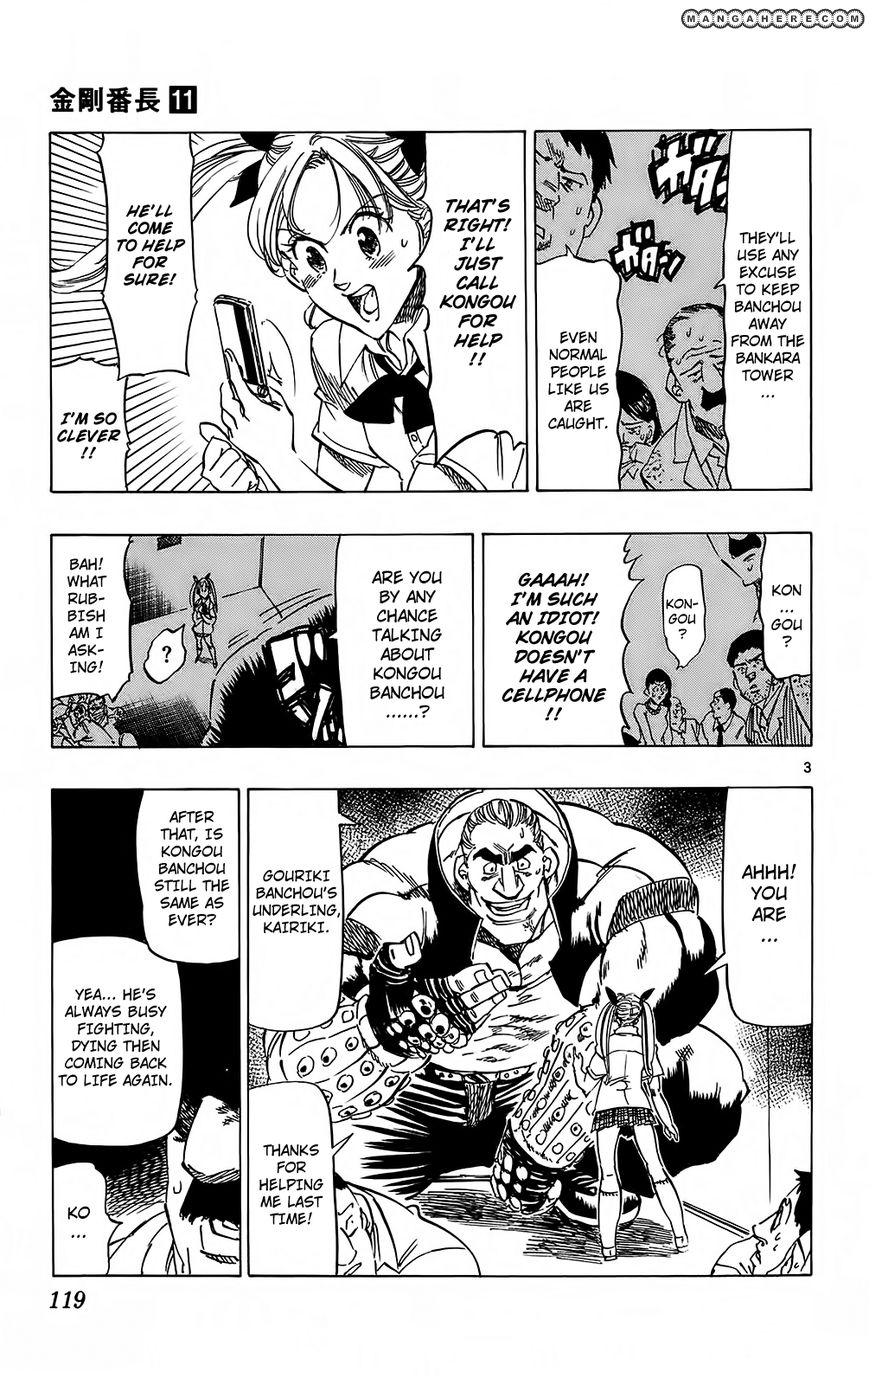 Kongou Banchou 102 Page 3